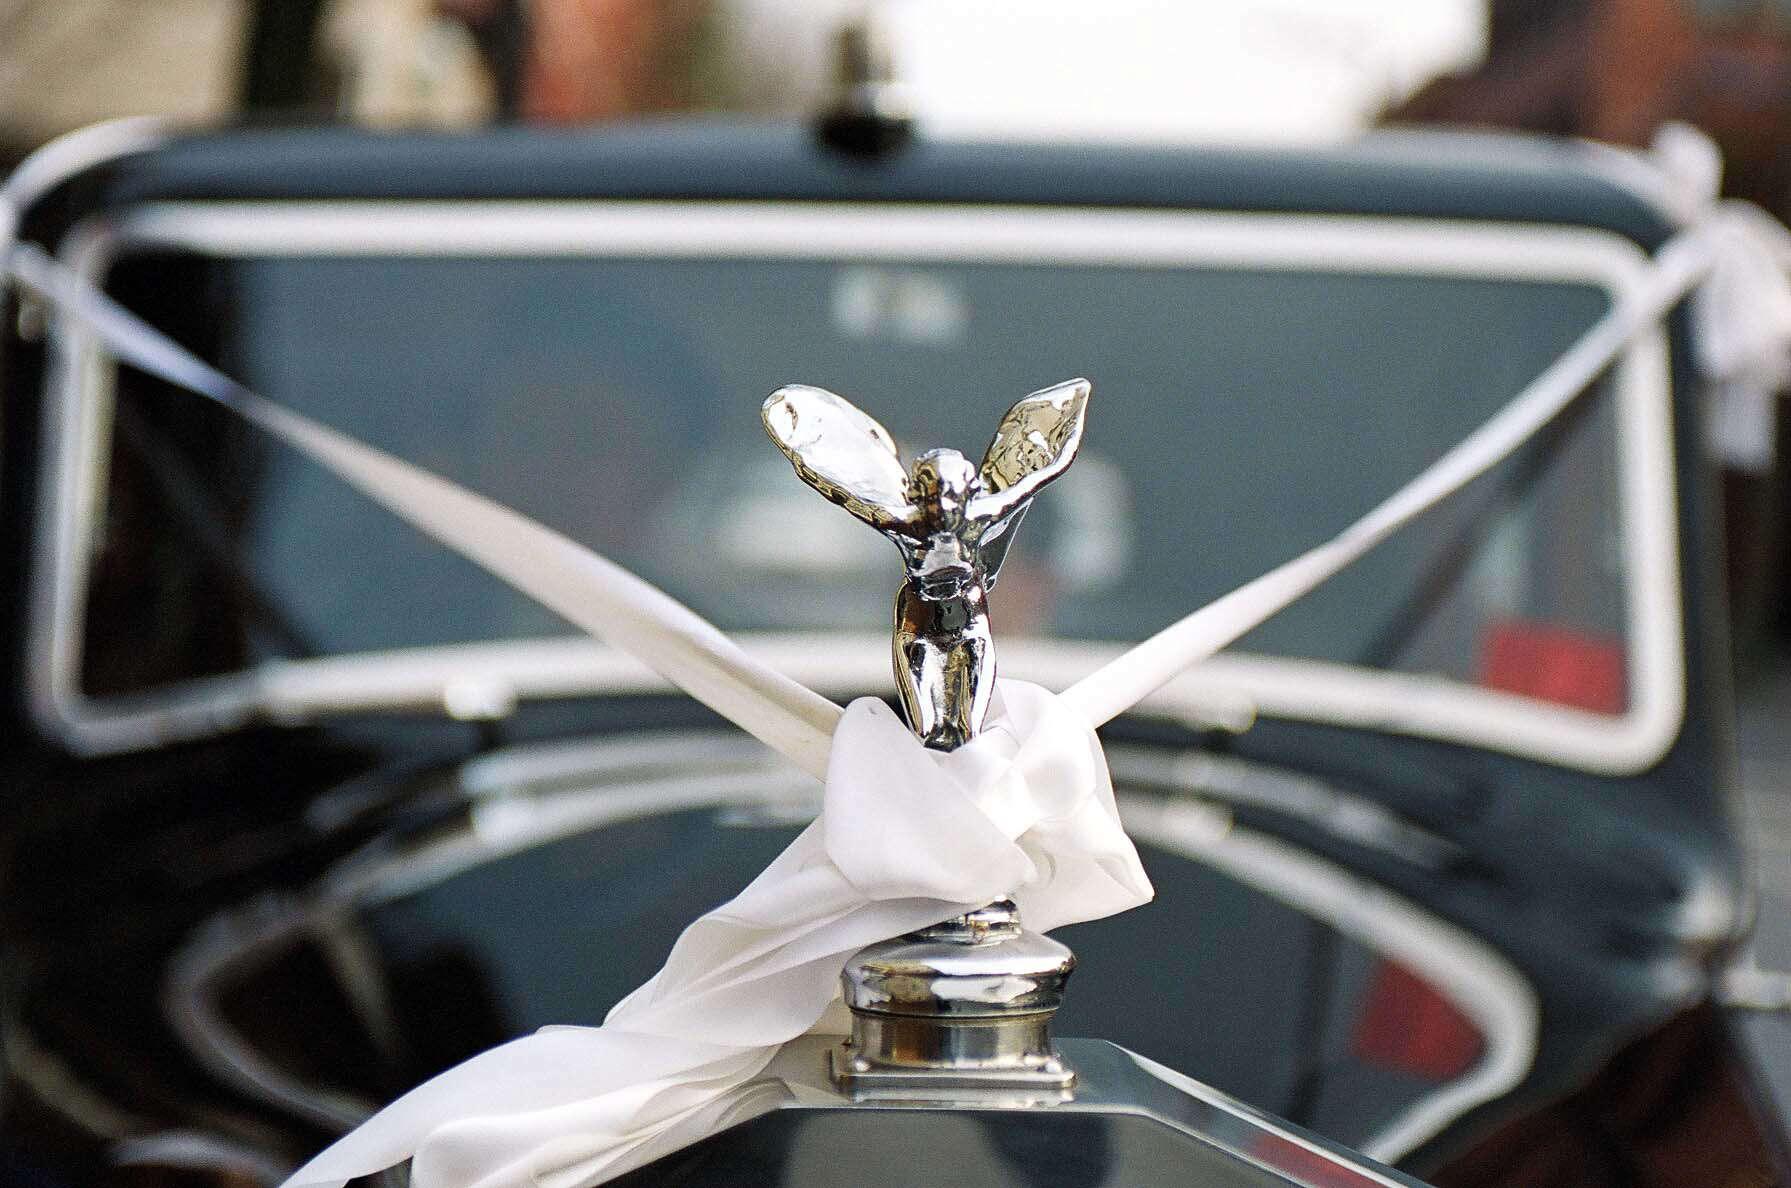 Vancouver Rolls Royce Wedding car